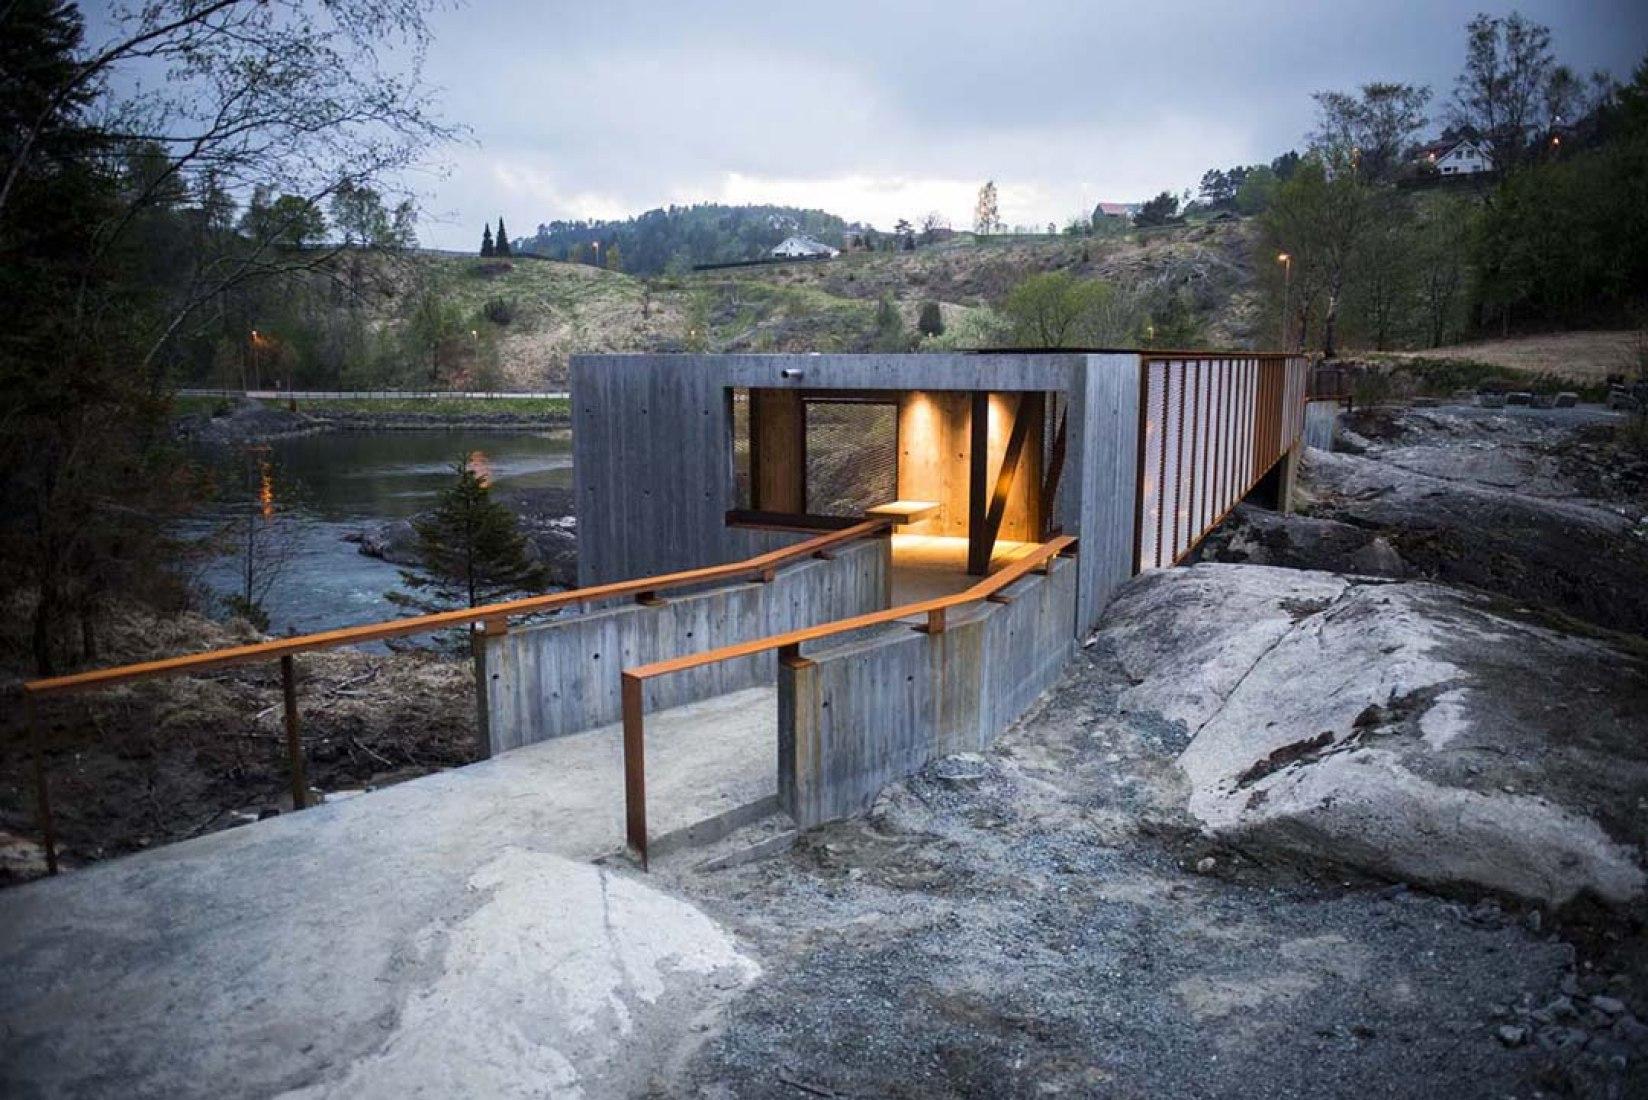 Acceso al puente. Høse Bridge por Rintala Eggertsson Architects. Fotografía © Dag Jenssen.